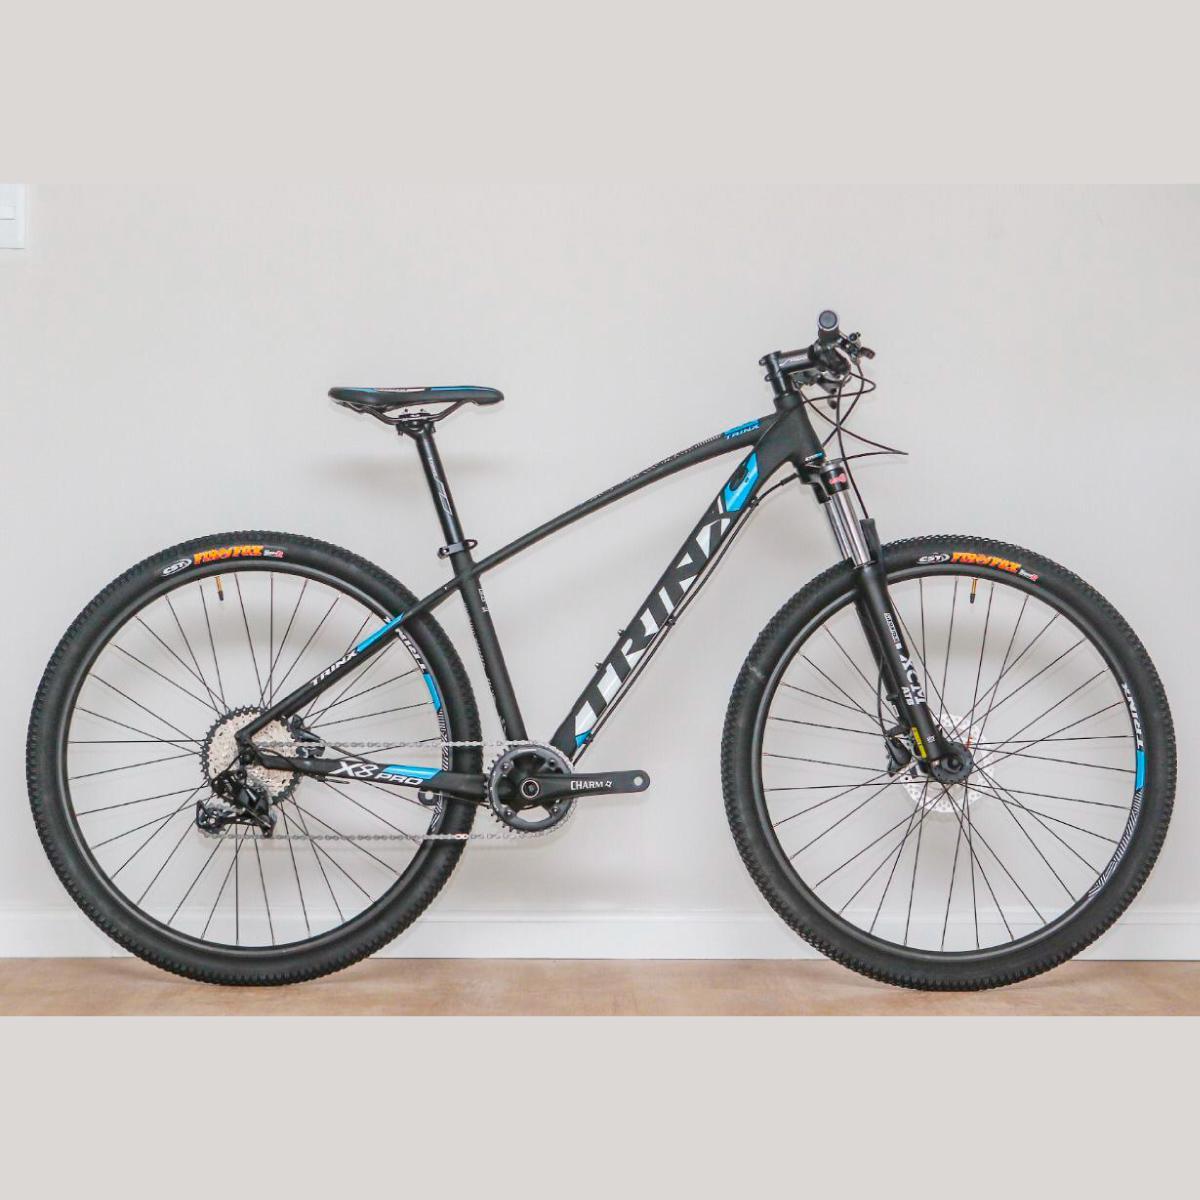 Bike Trinx X8 Pro 2020 11v Sram Preto Azul